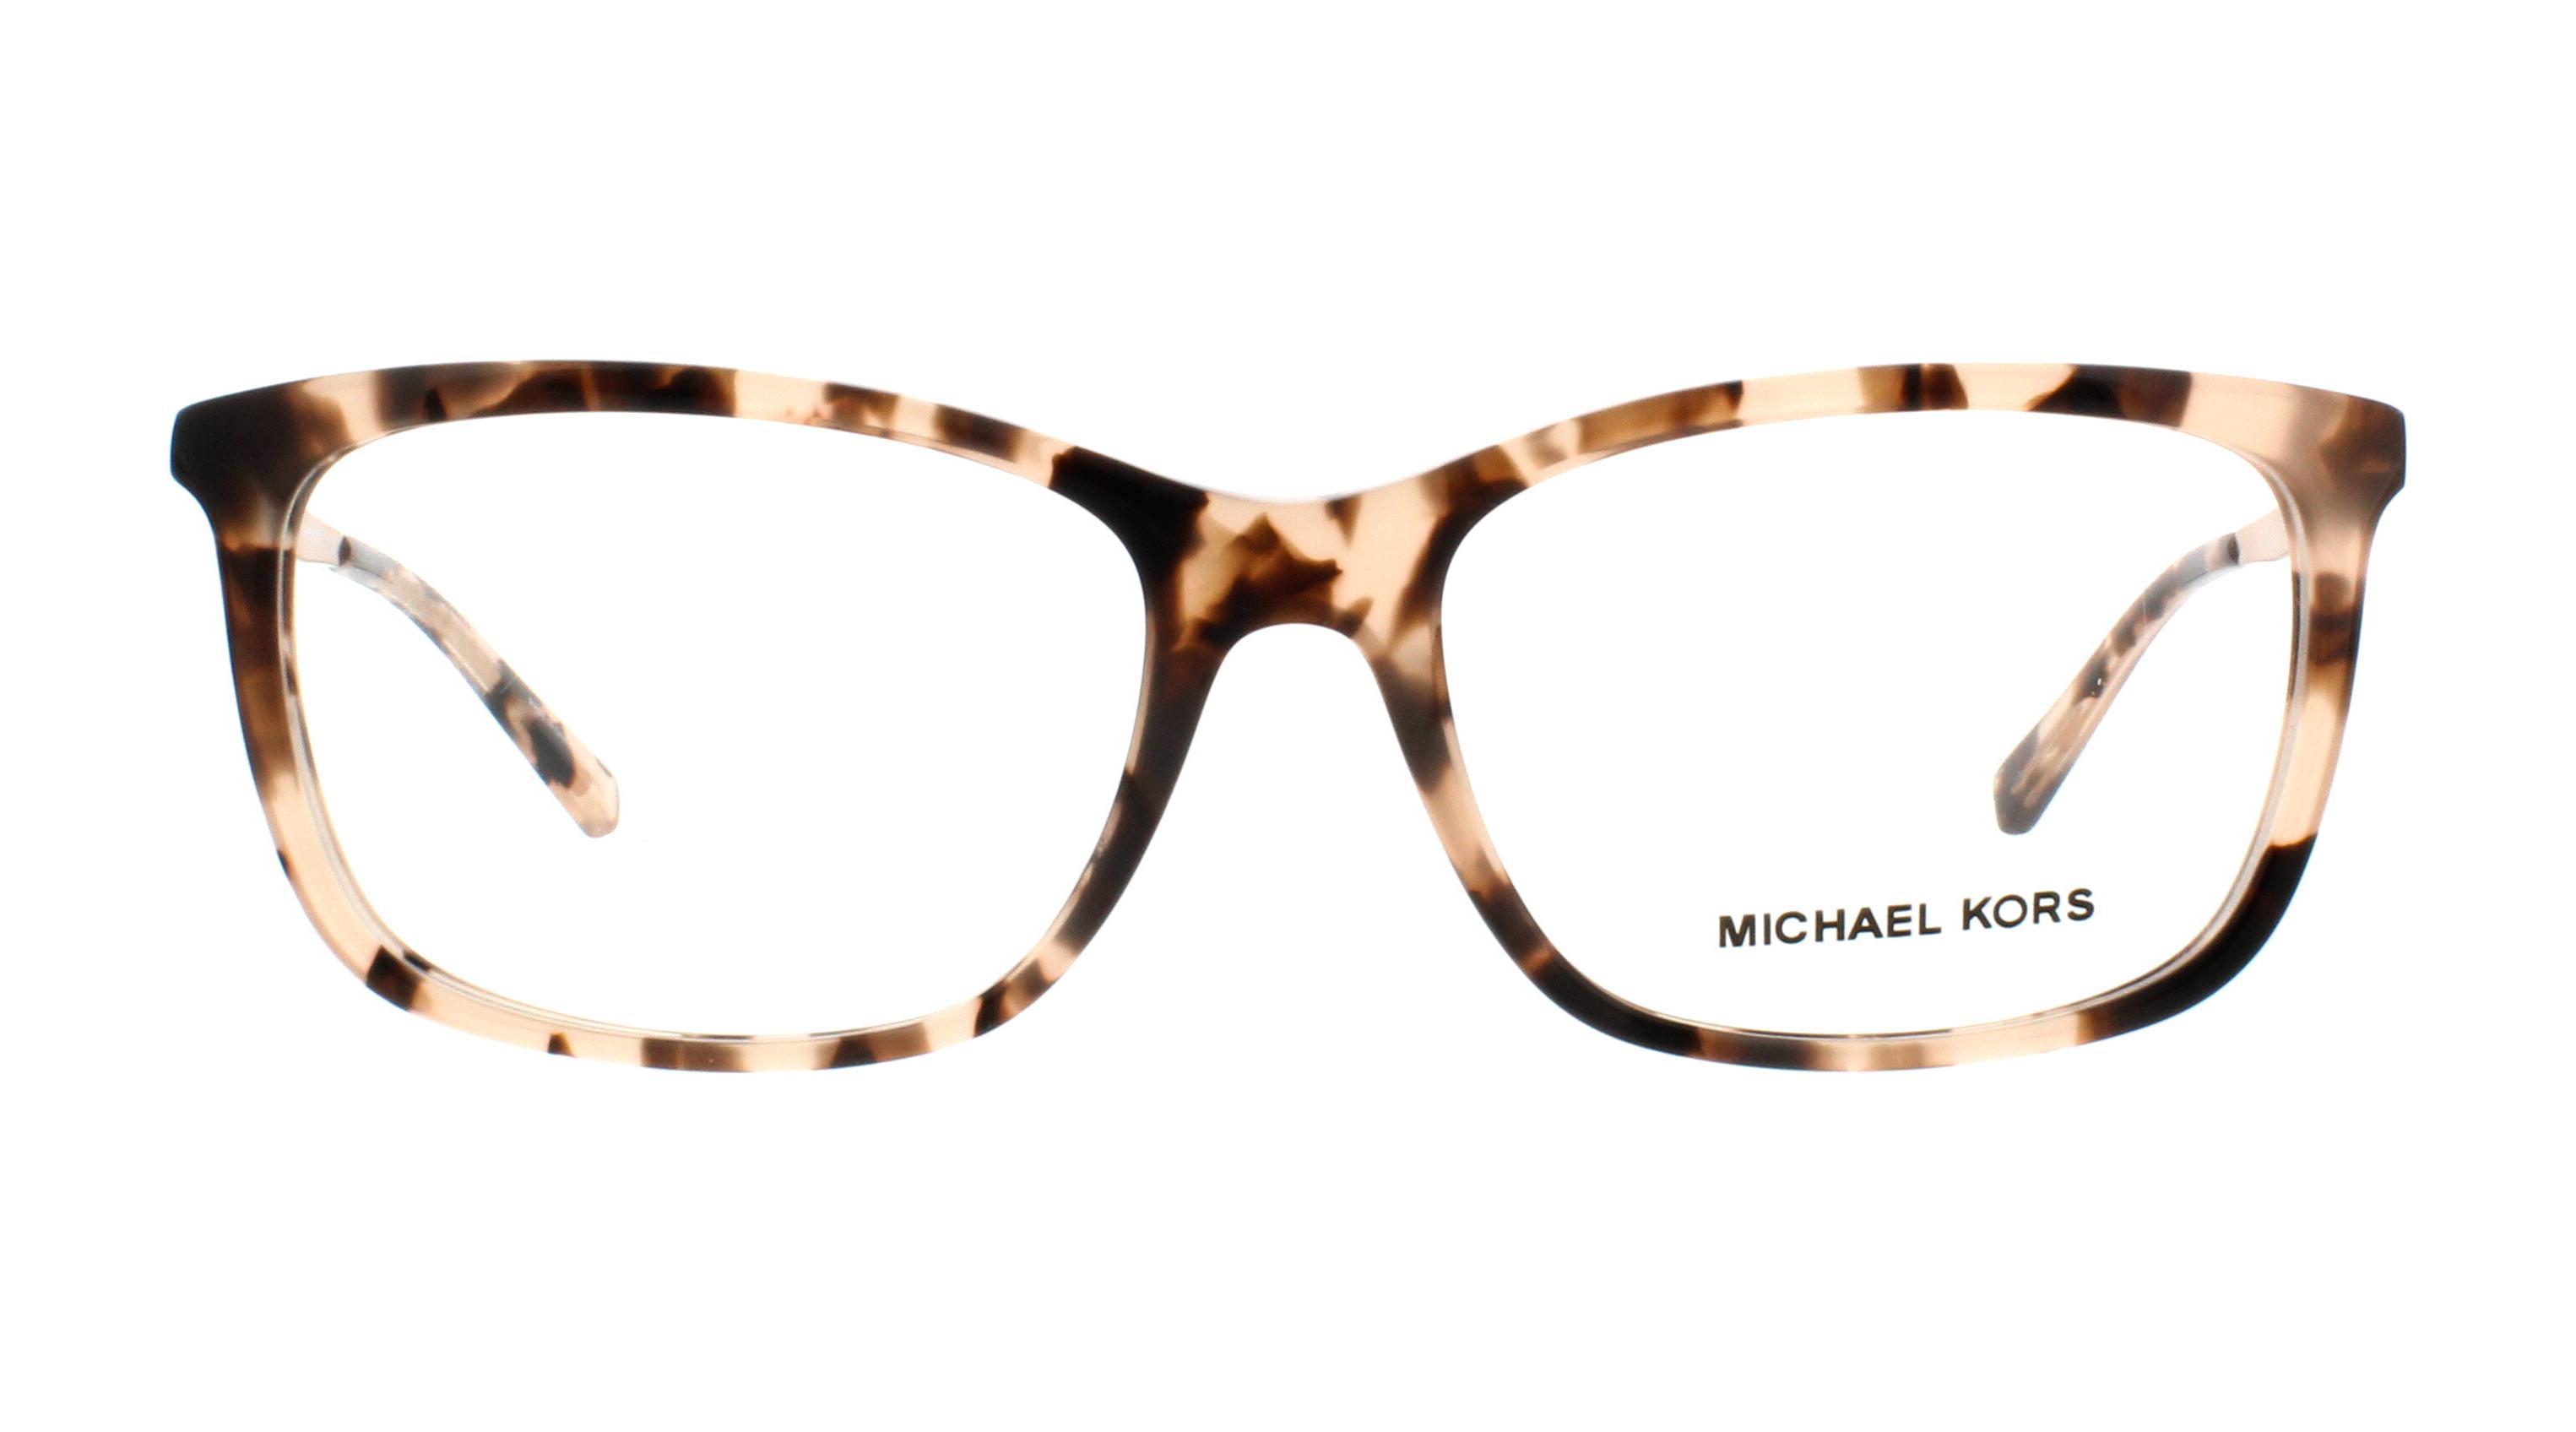 50f07cb387 MICHAEL KORS Eyeglasses MK4030 VIVIANNA II 3162 Pink Tortoise 54MM ...